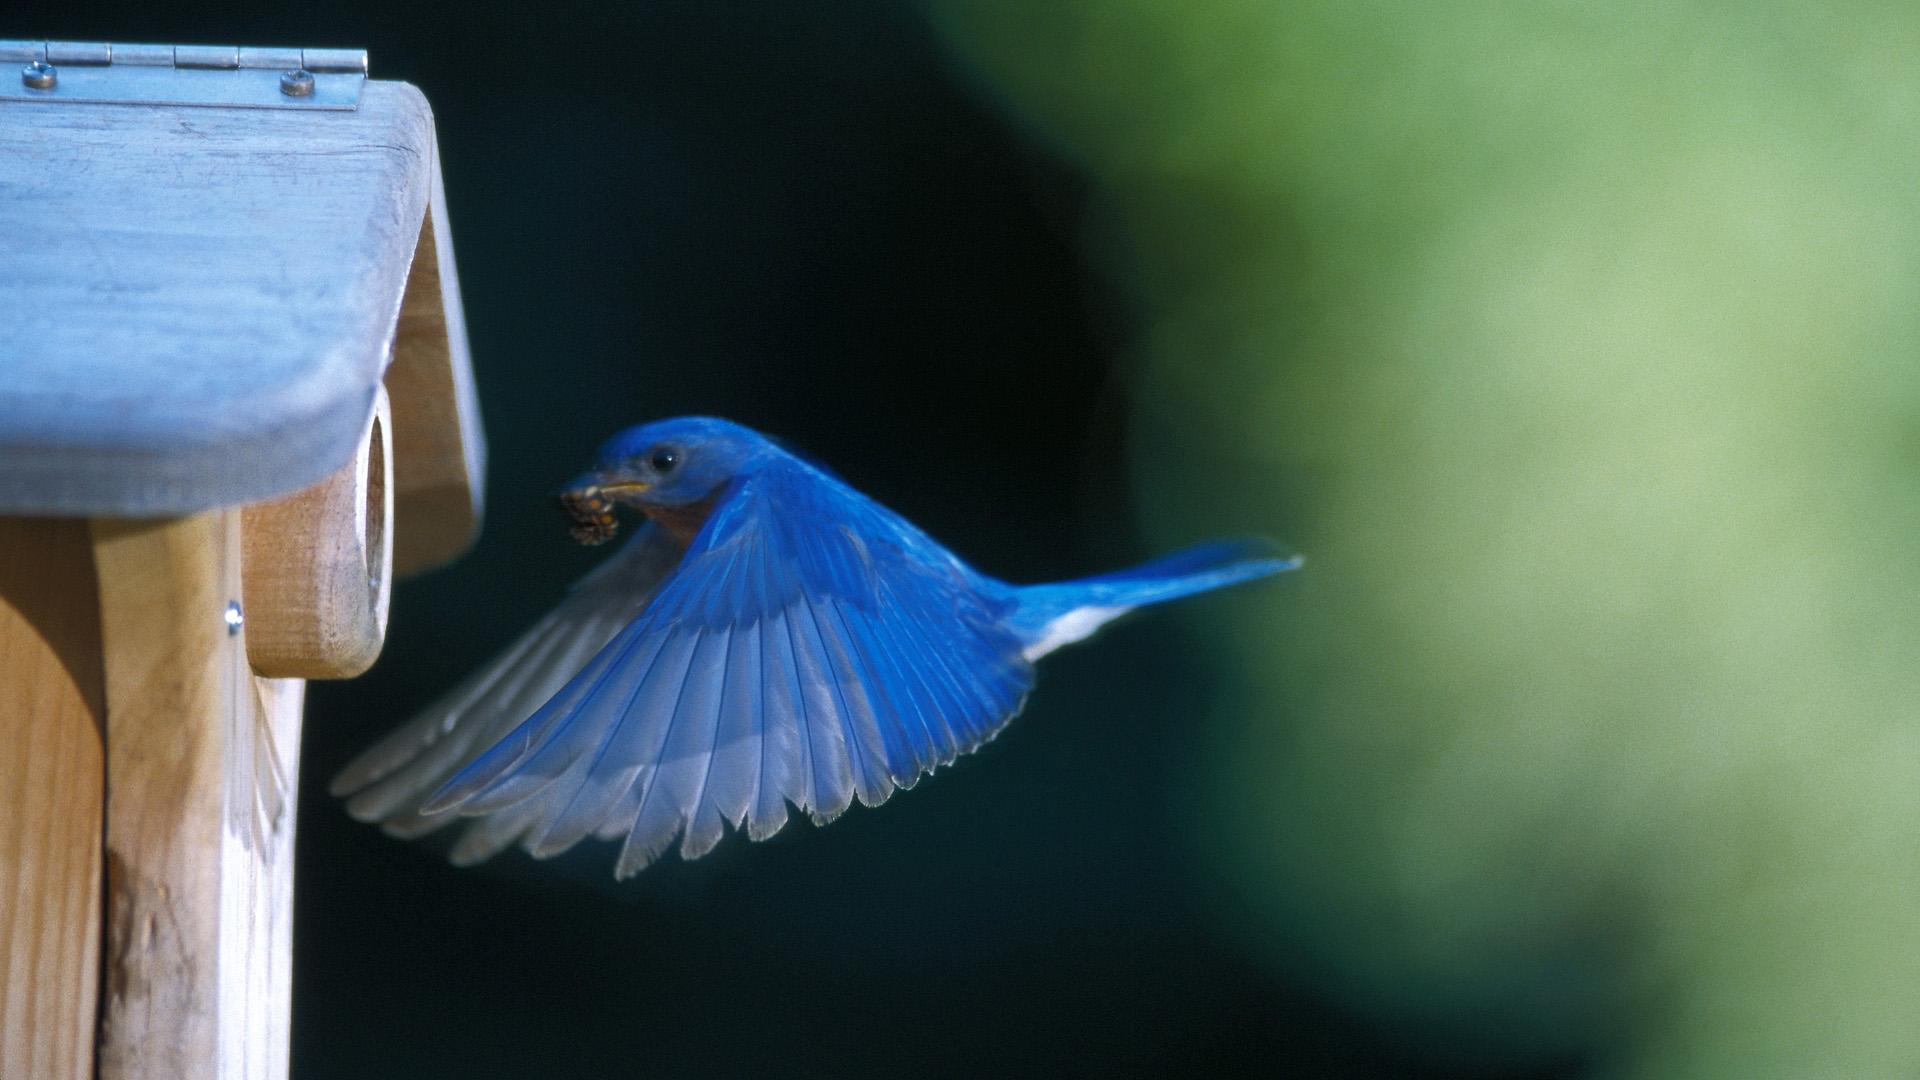 Wallpapers Hd Flying Birds Apple Animals Blue Sky Desktop: Flying Blue Bird HD Wallpaper